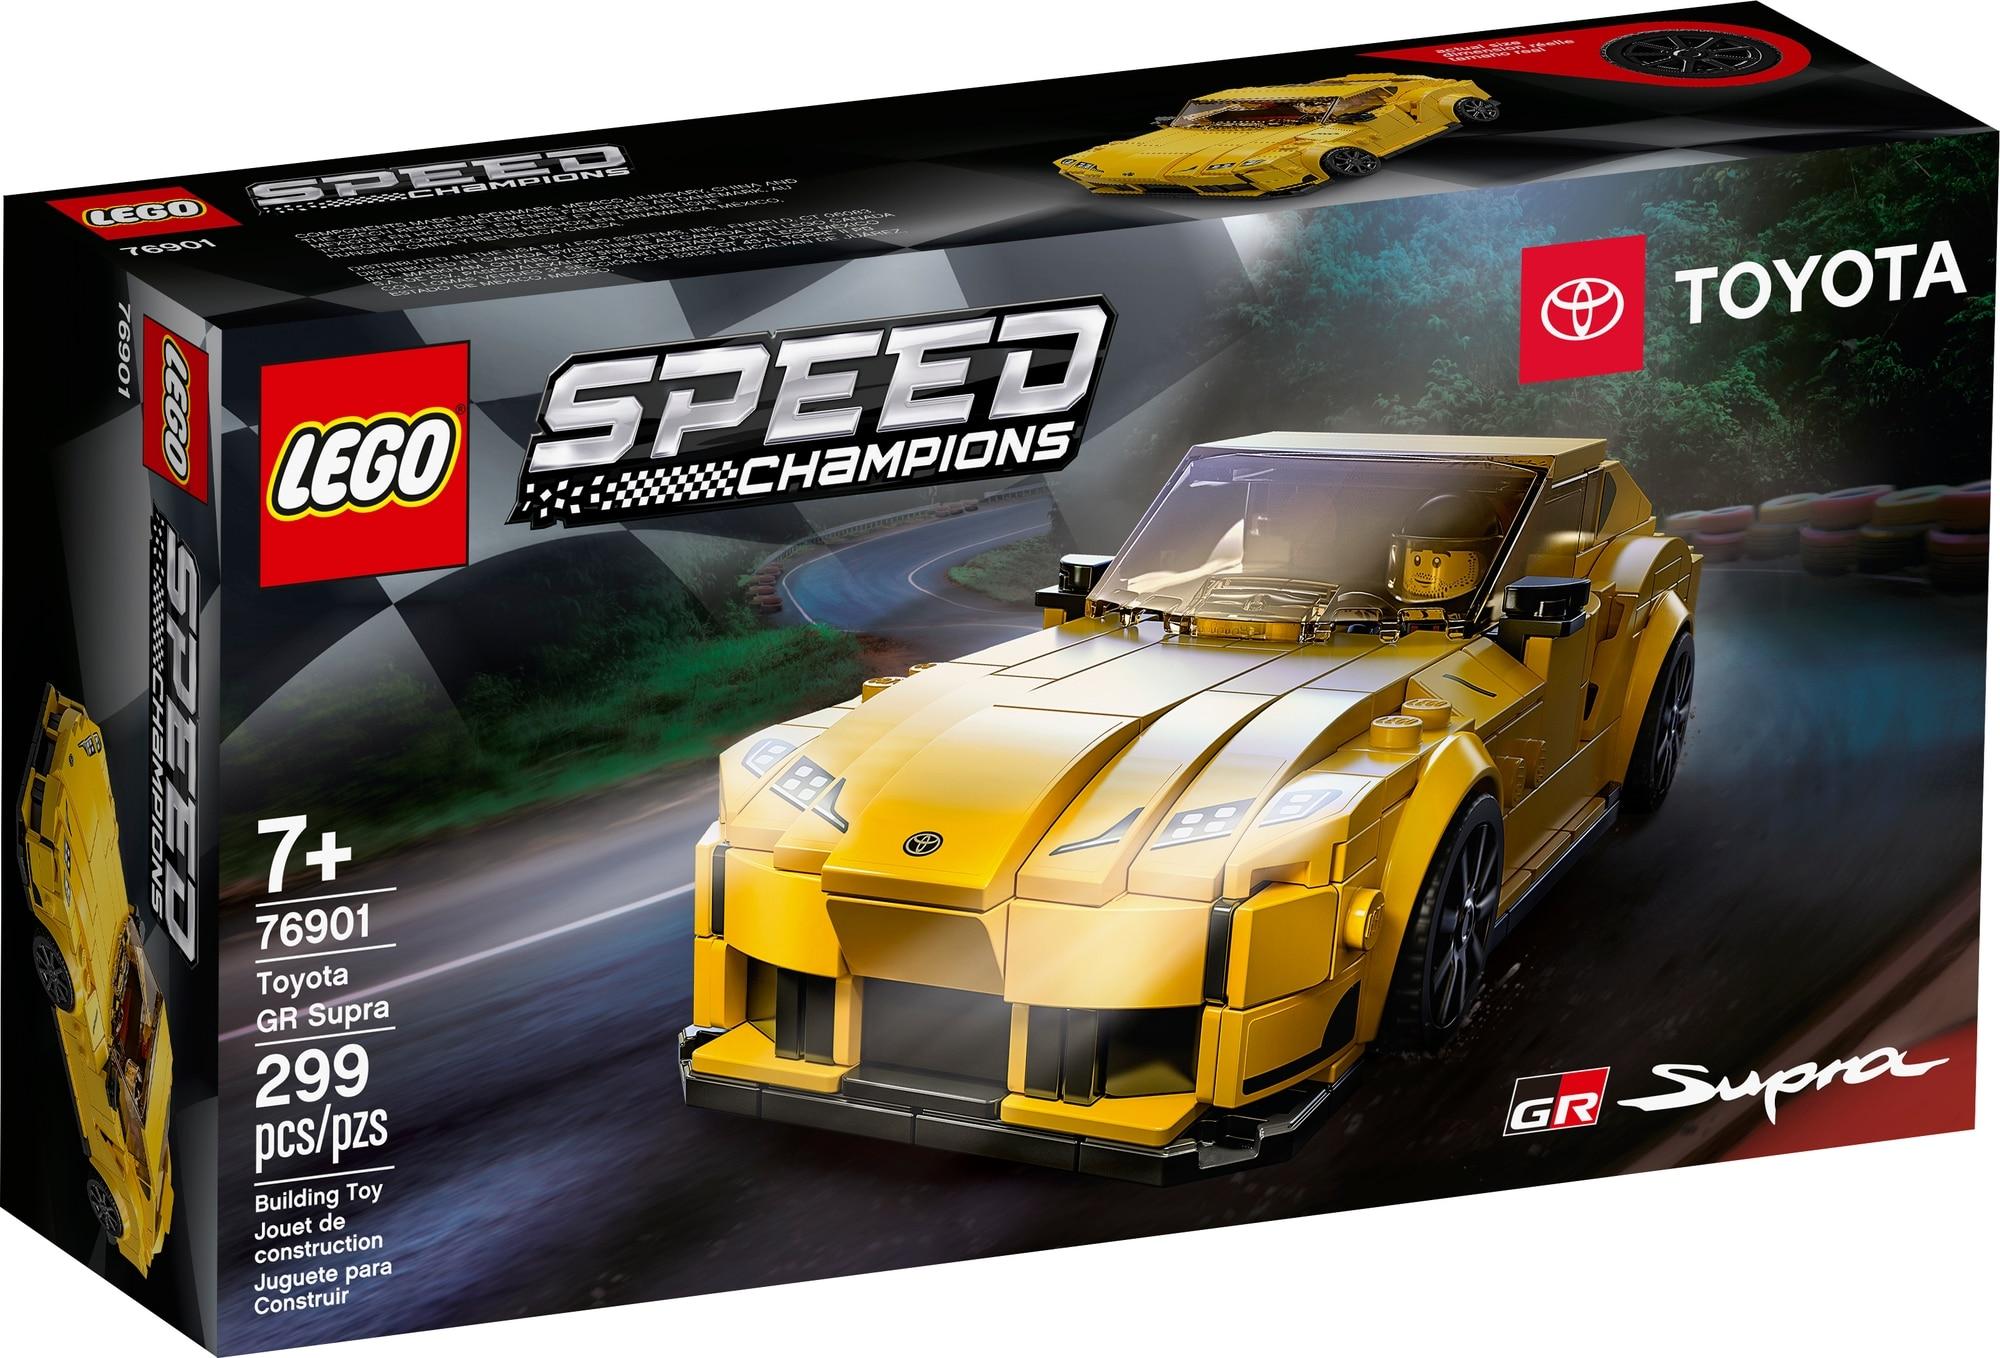 LEGO Speed Champions 76901 Toyota Gr Supra 2